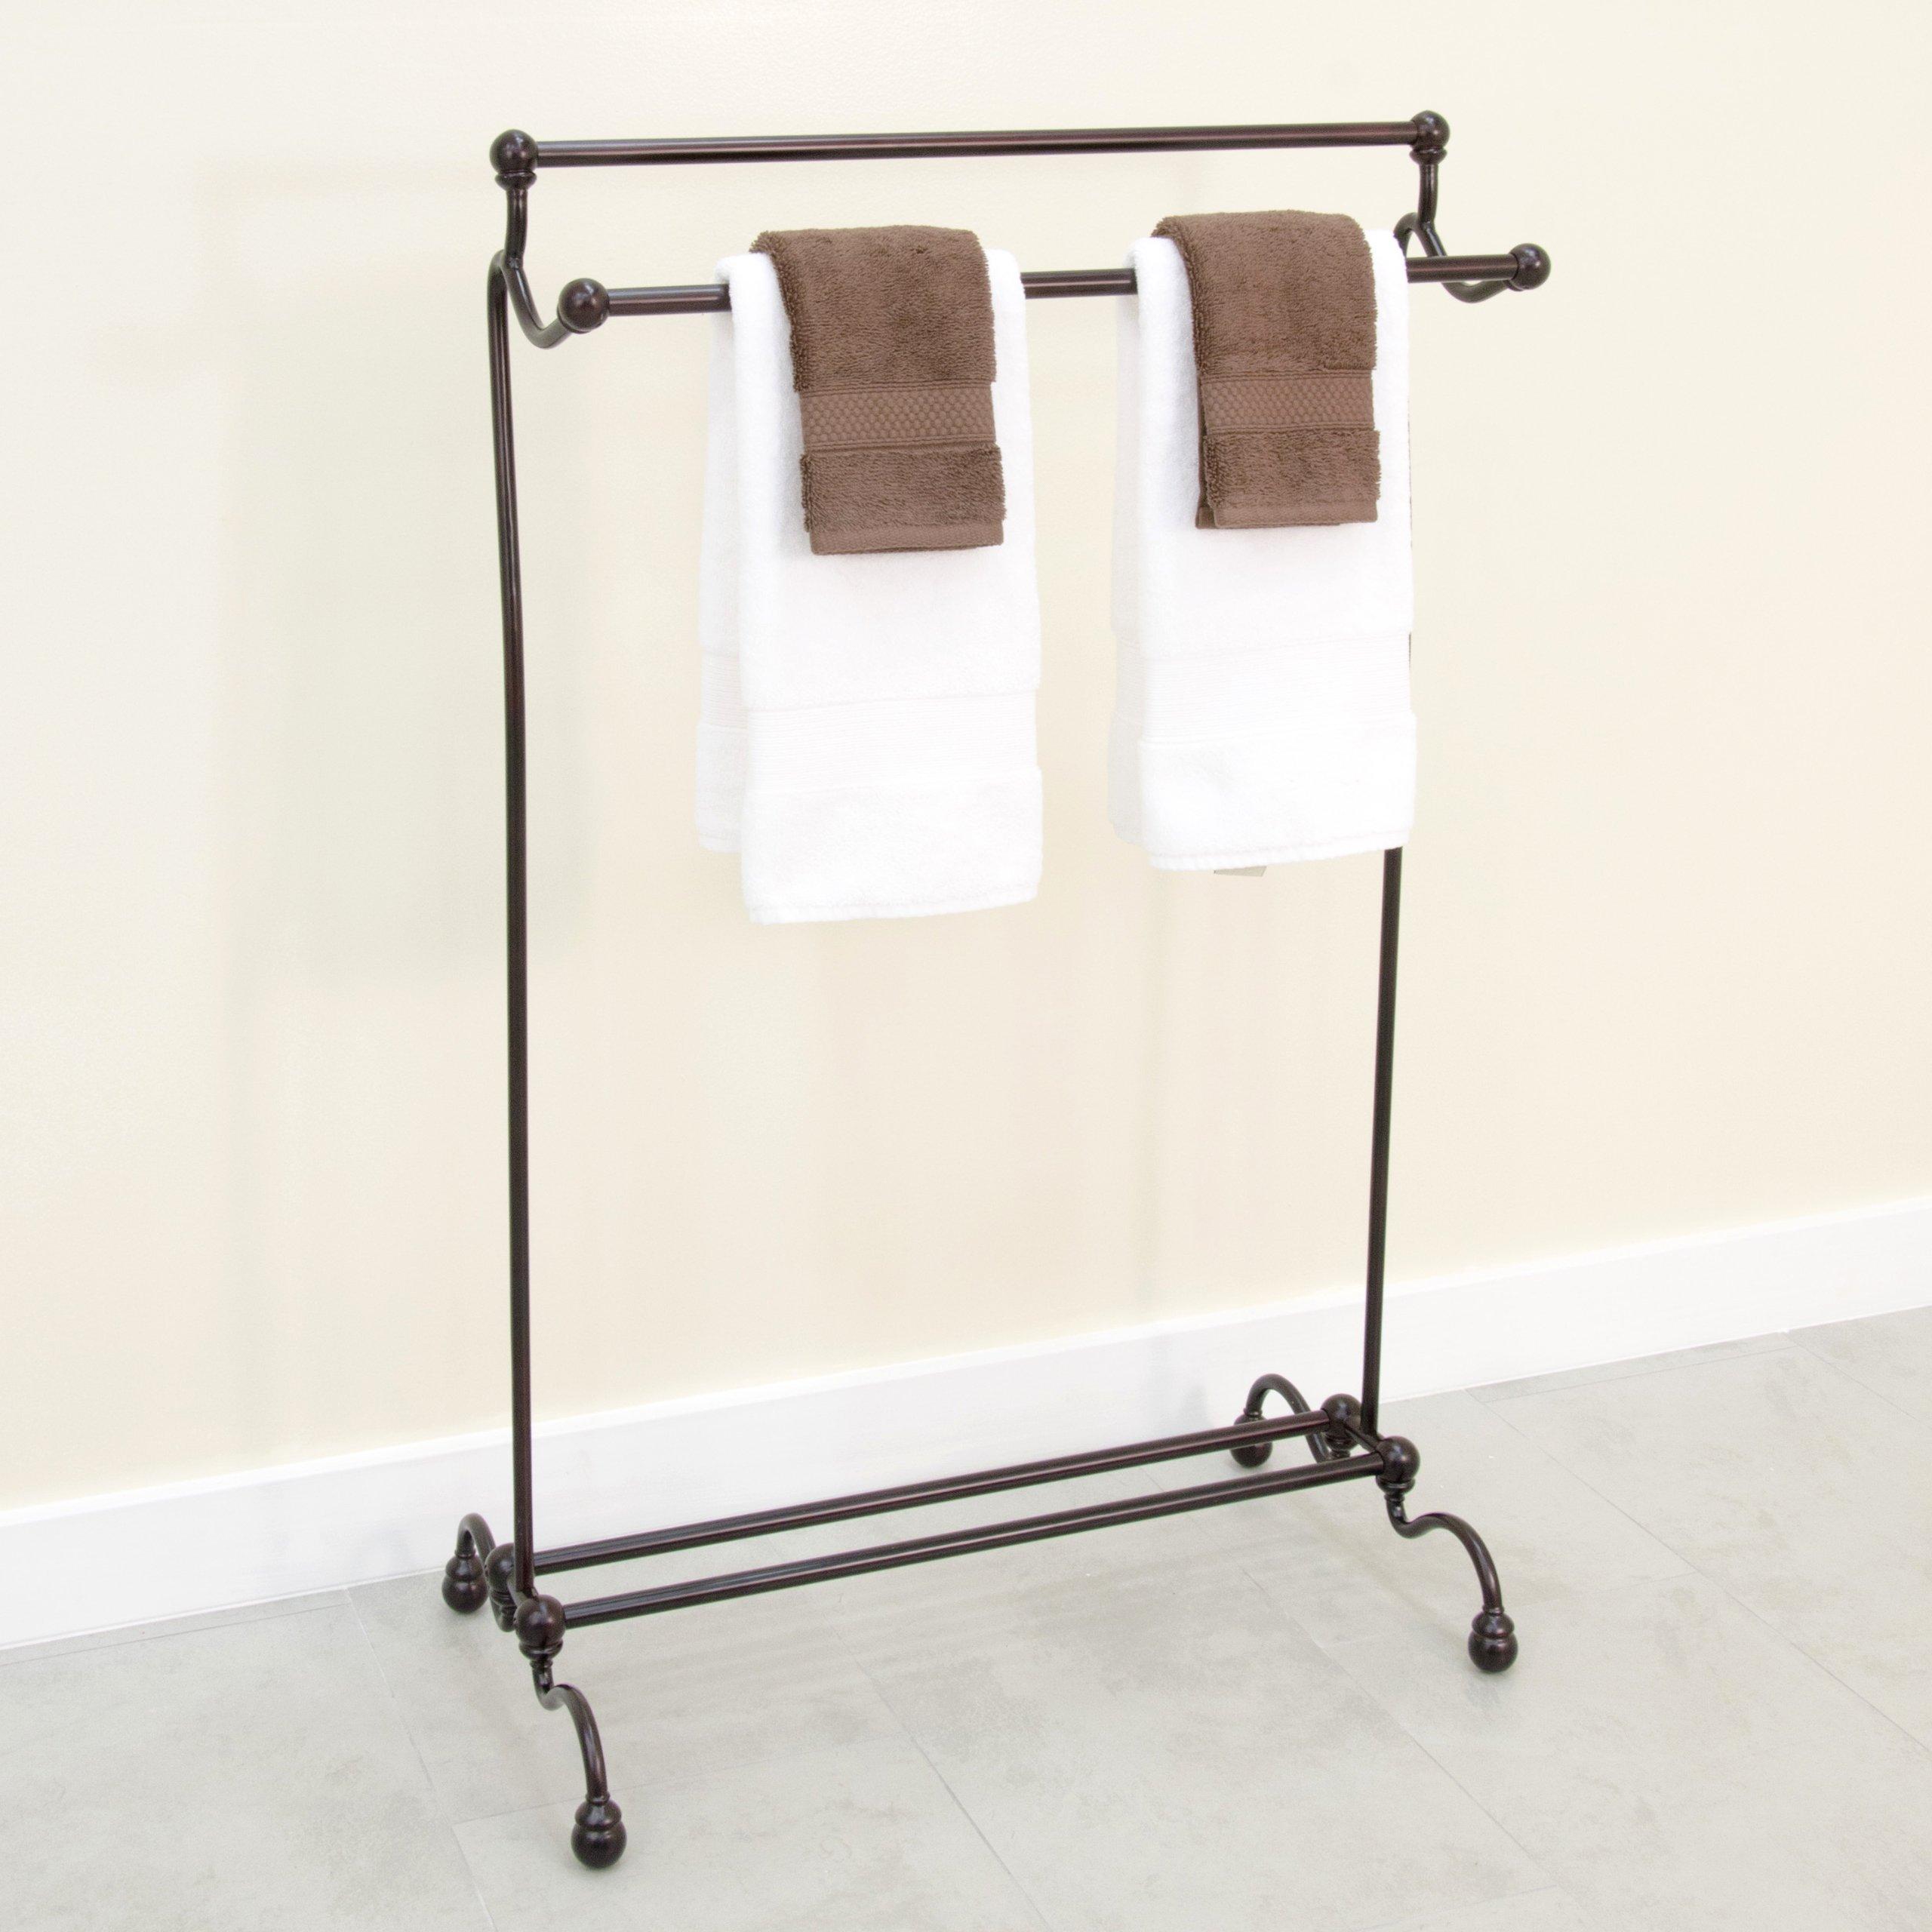 Kitchen Cabinet Towel Bar